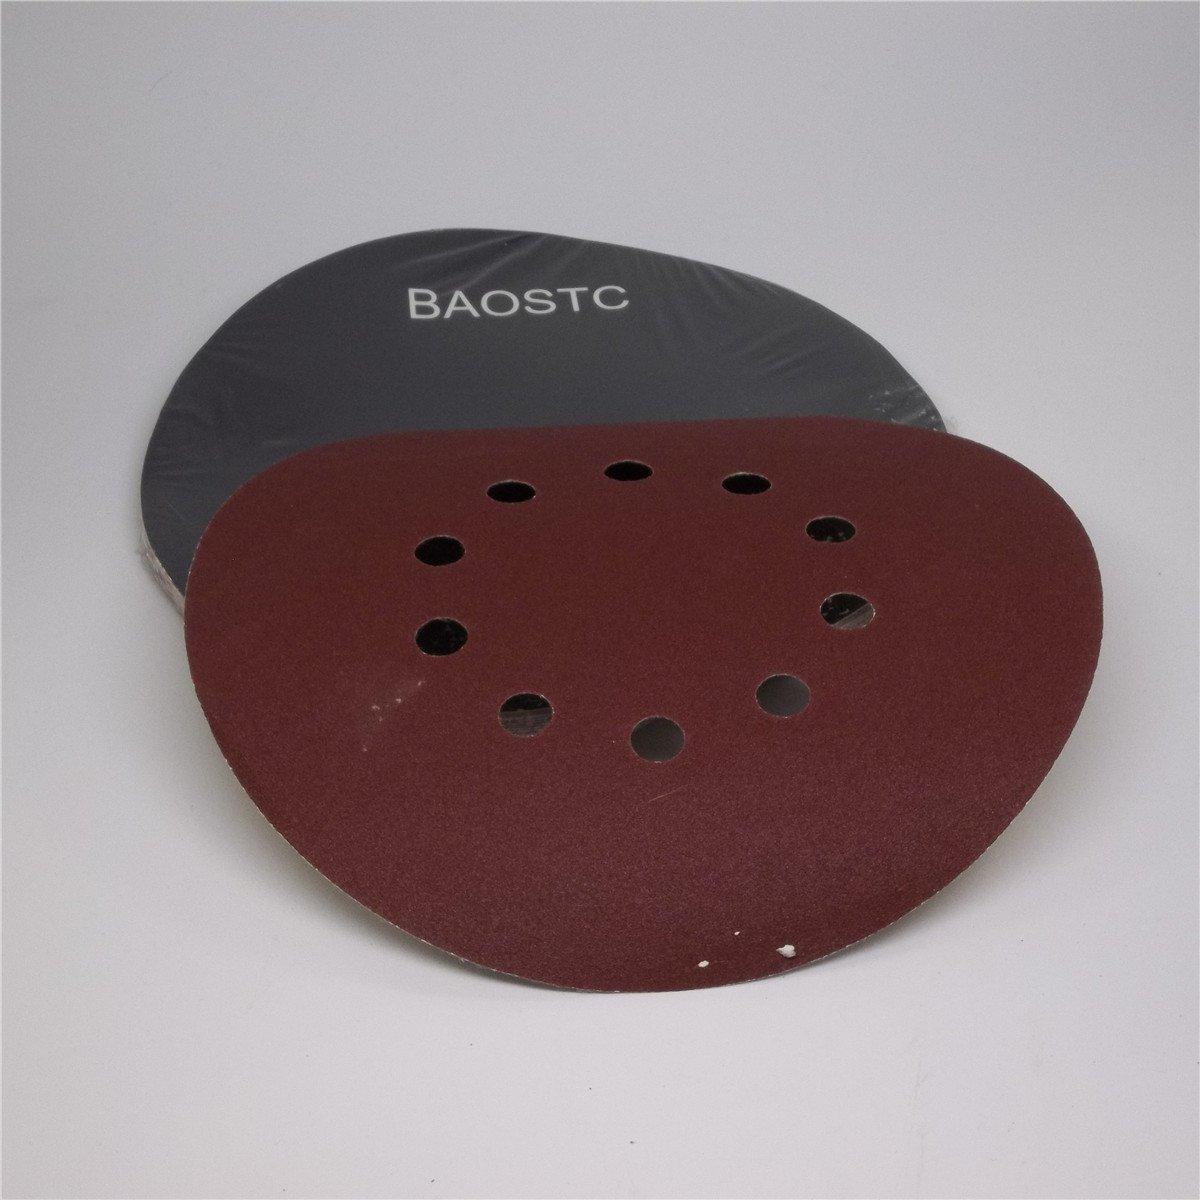 BAOSTC 8 7//8 10 holes P180 hook and loop abrasive disc for drywall sander10PACK